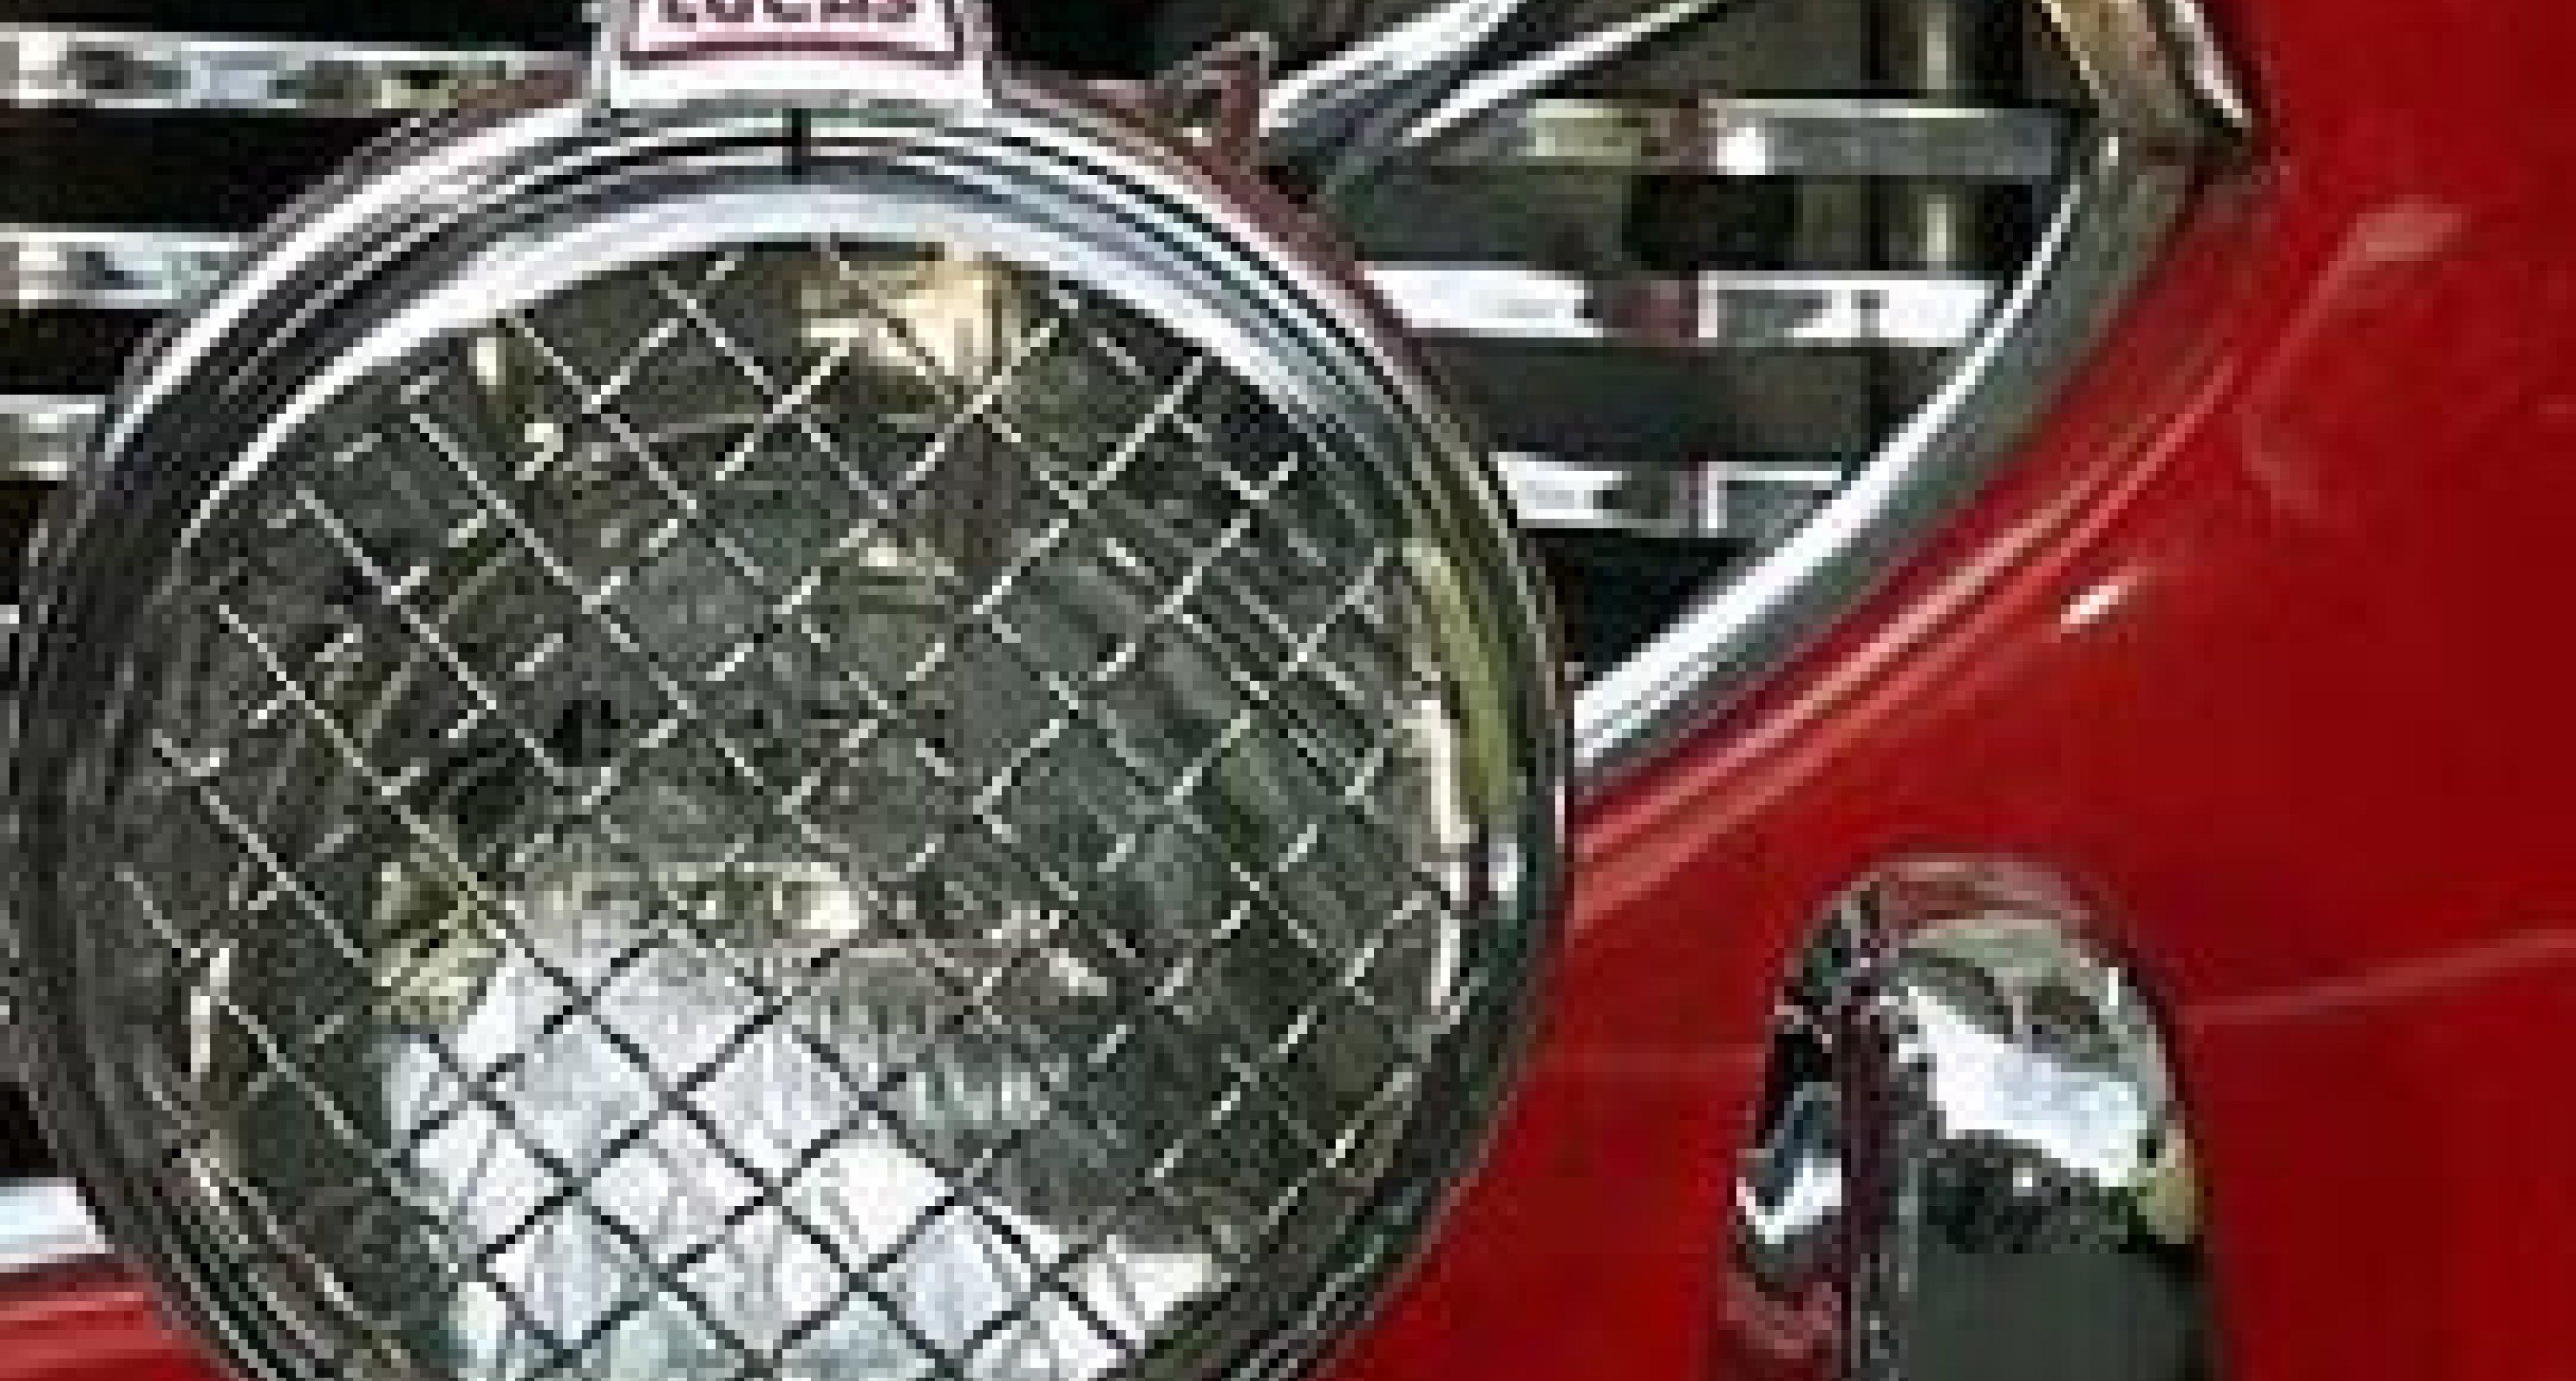 9. British Classic Car Meeting 2002